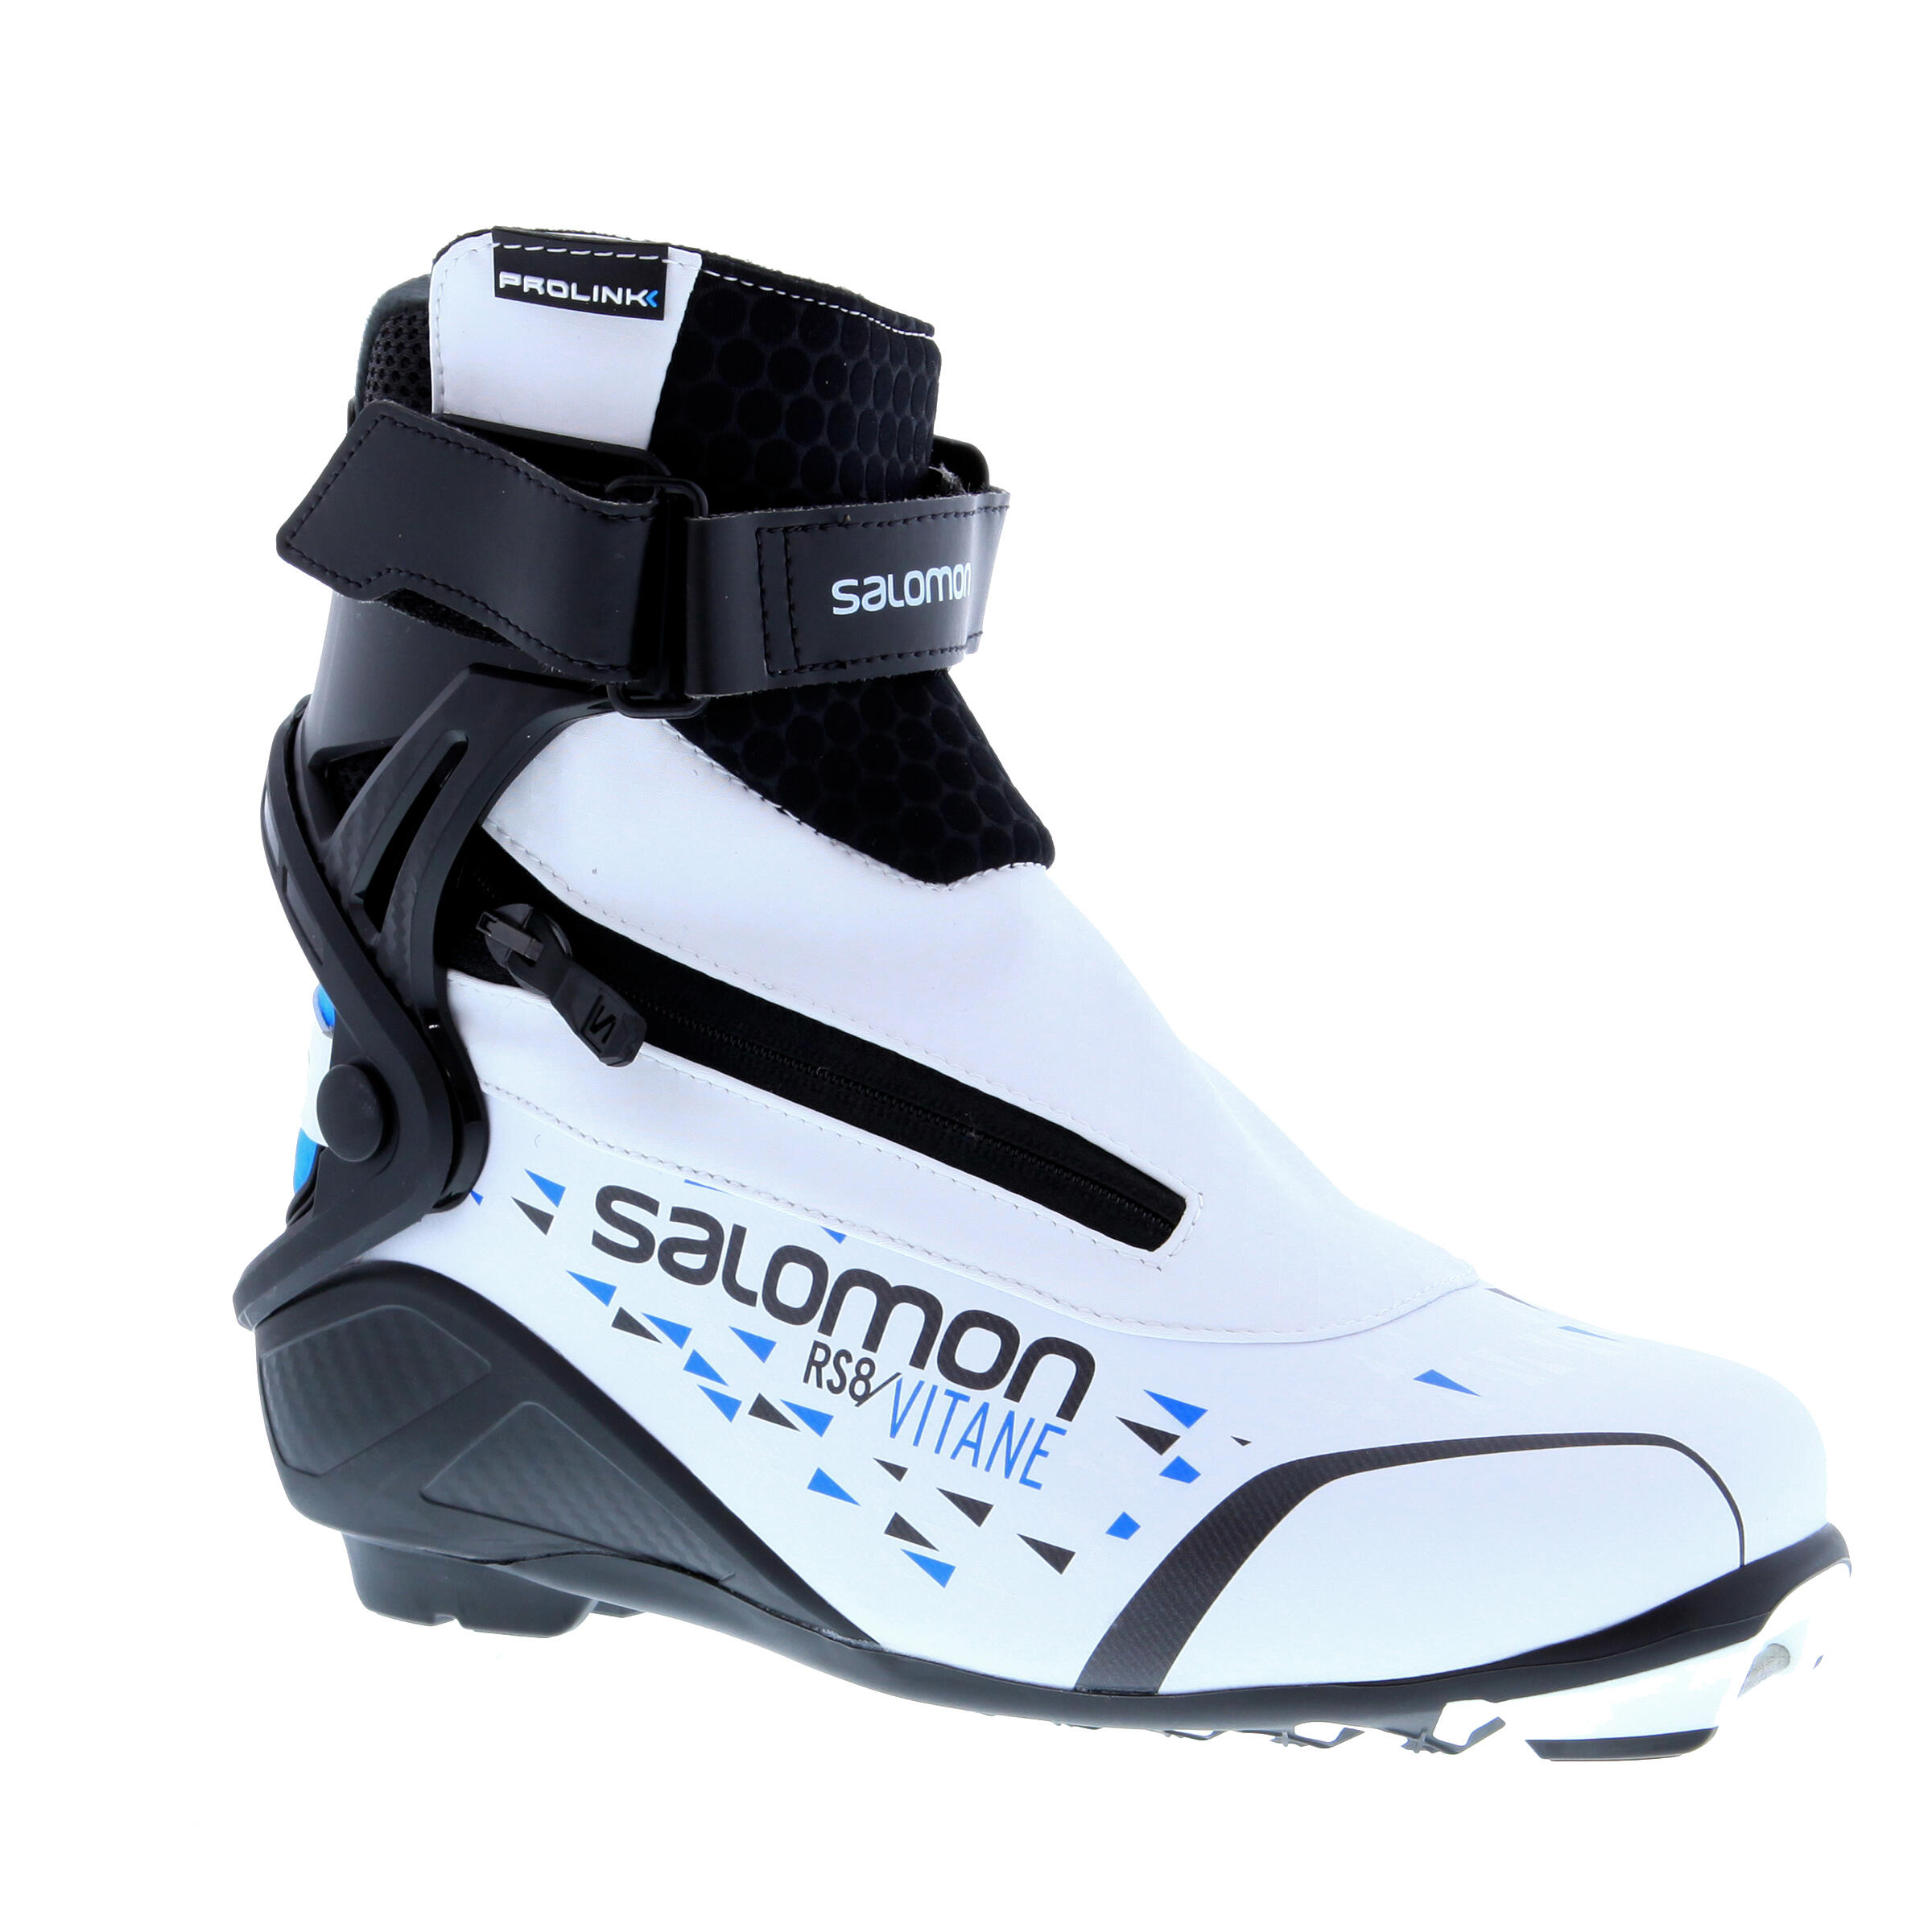 5a405b47dc7 Salomon Skating langlaufschoenen voor dames XC S Vitane RS8   Decathlon